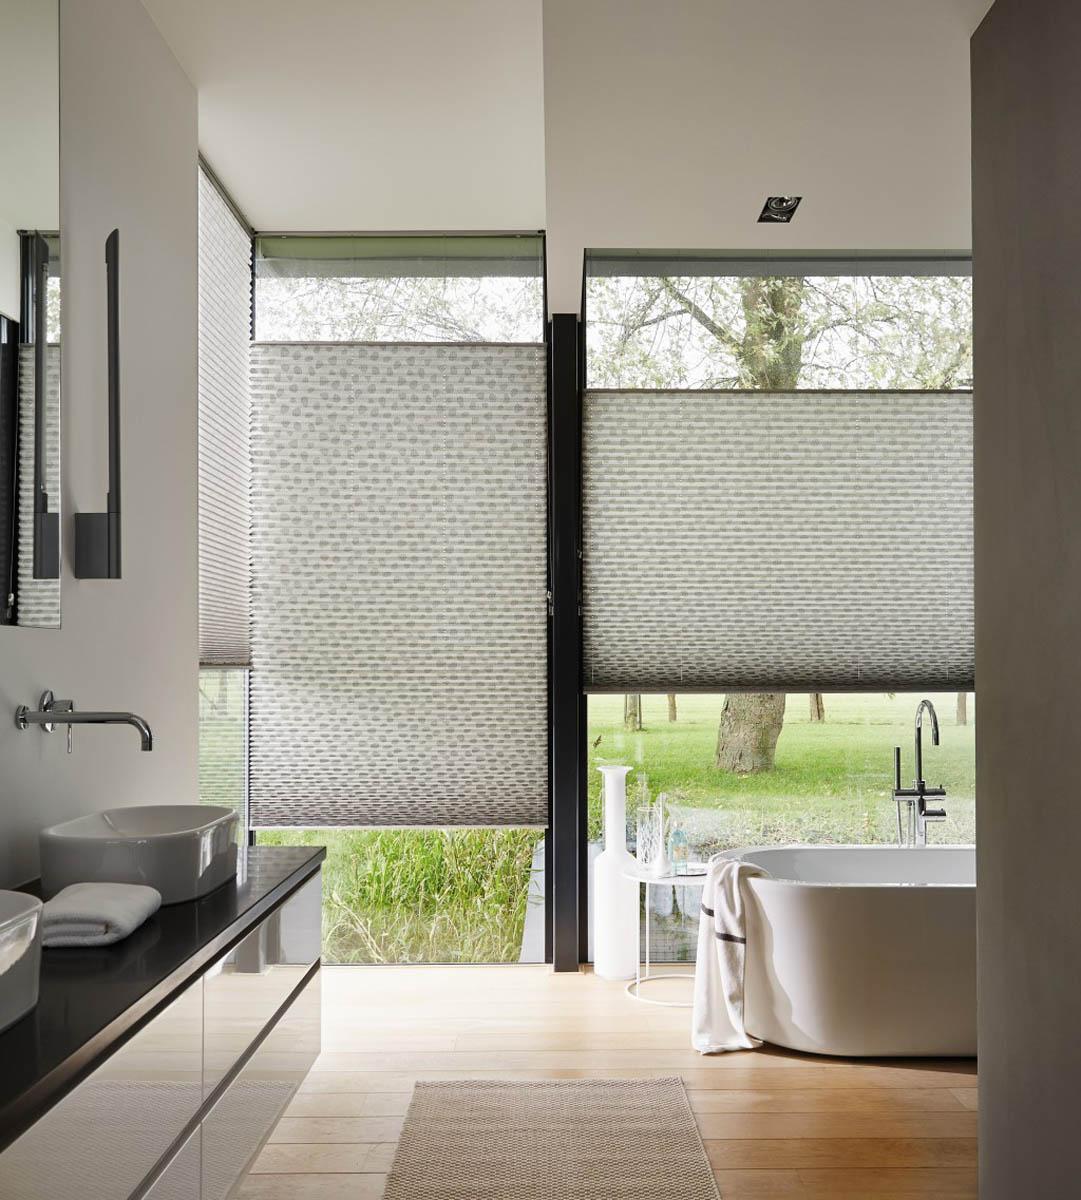 plissee sonnenschutz traw ger e u. Black Bedroom Furniture Sets. Home Design Ideas